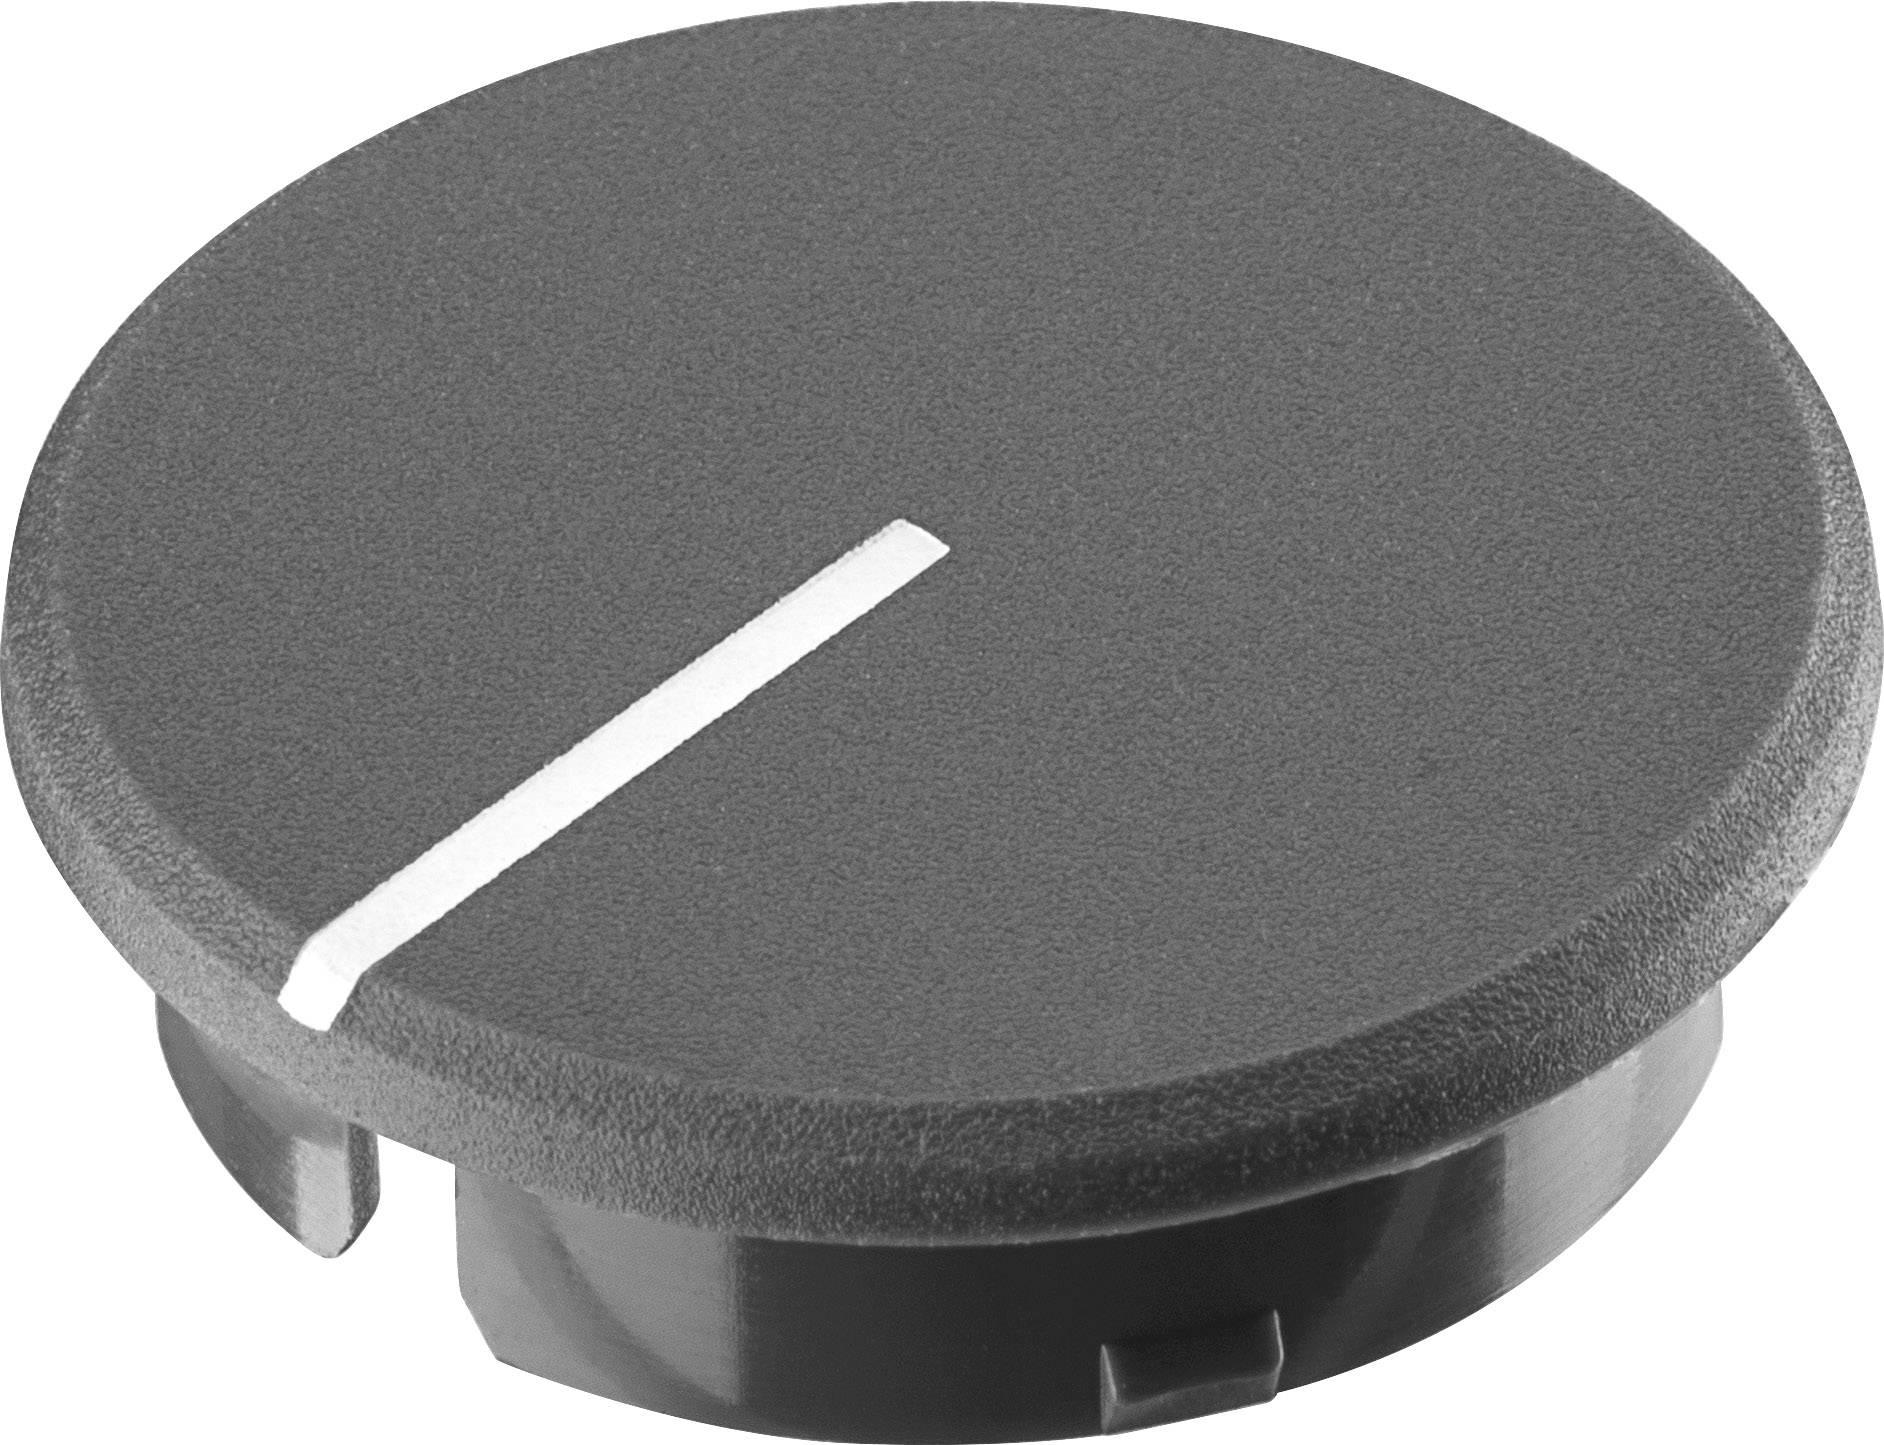 Krytka knoflíku s ukazatelem Ritel 30 28 11 2 21.6 mm, šedá, 1 ks